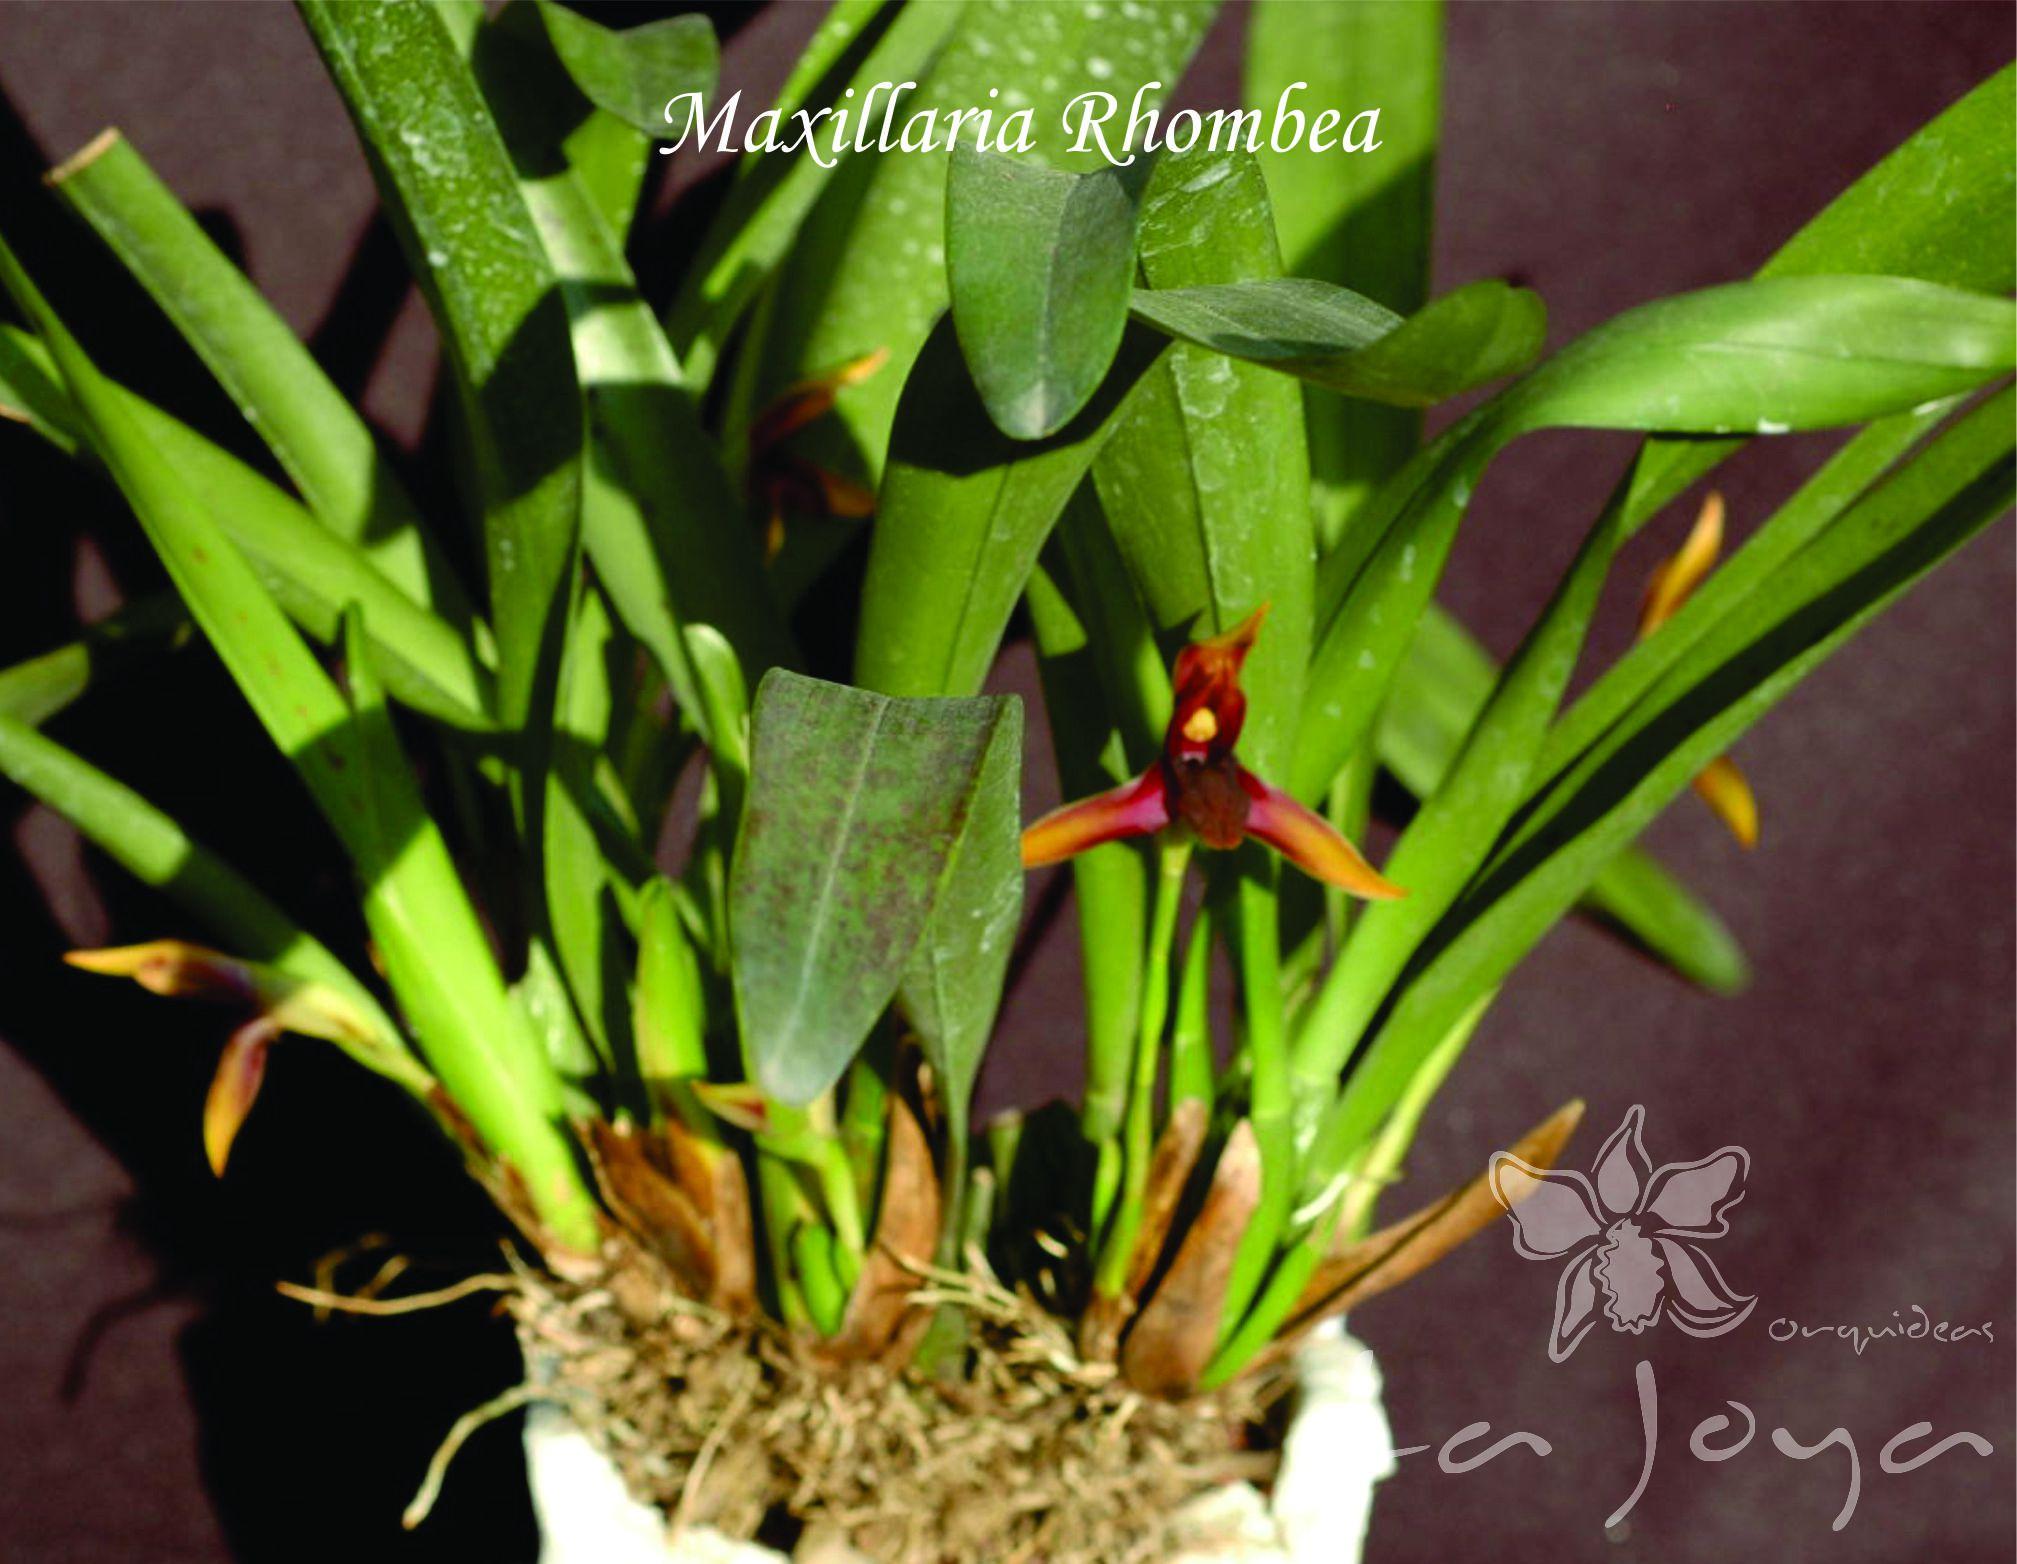 Maxillaria Rhombea